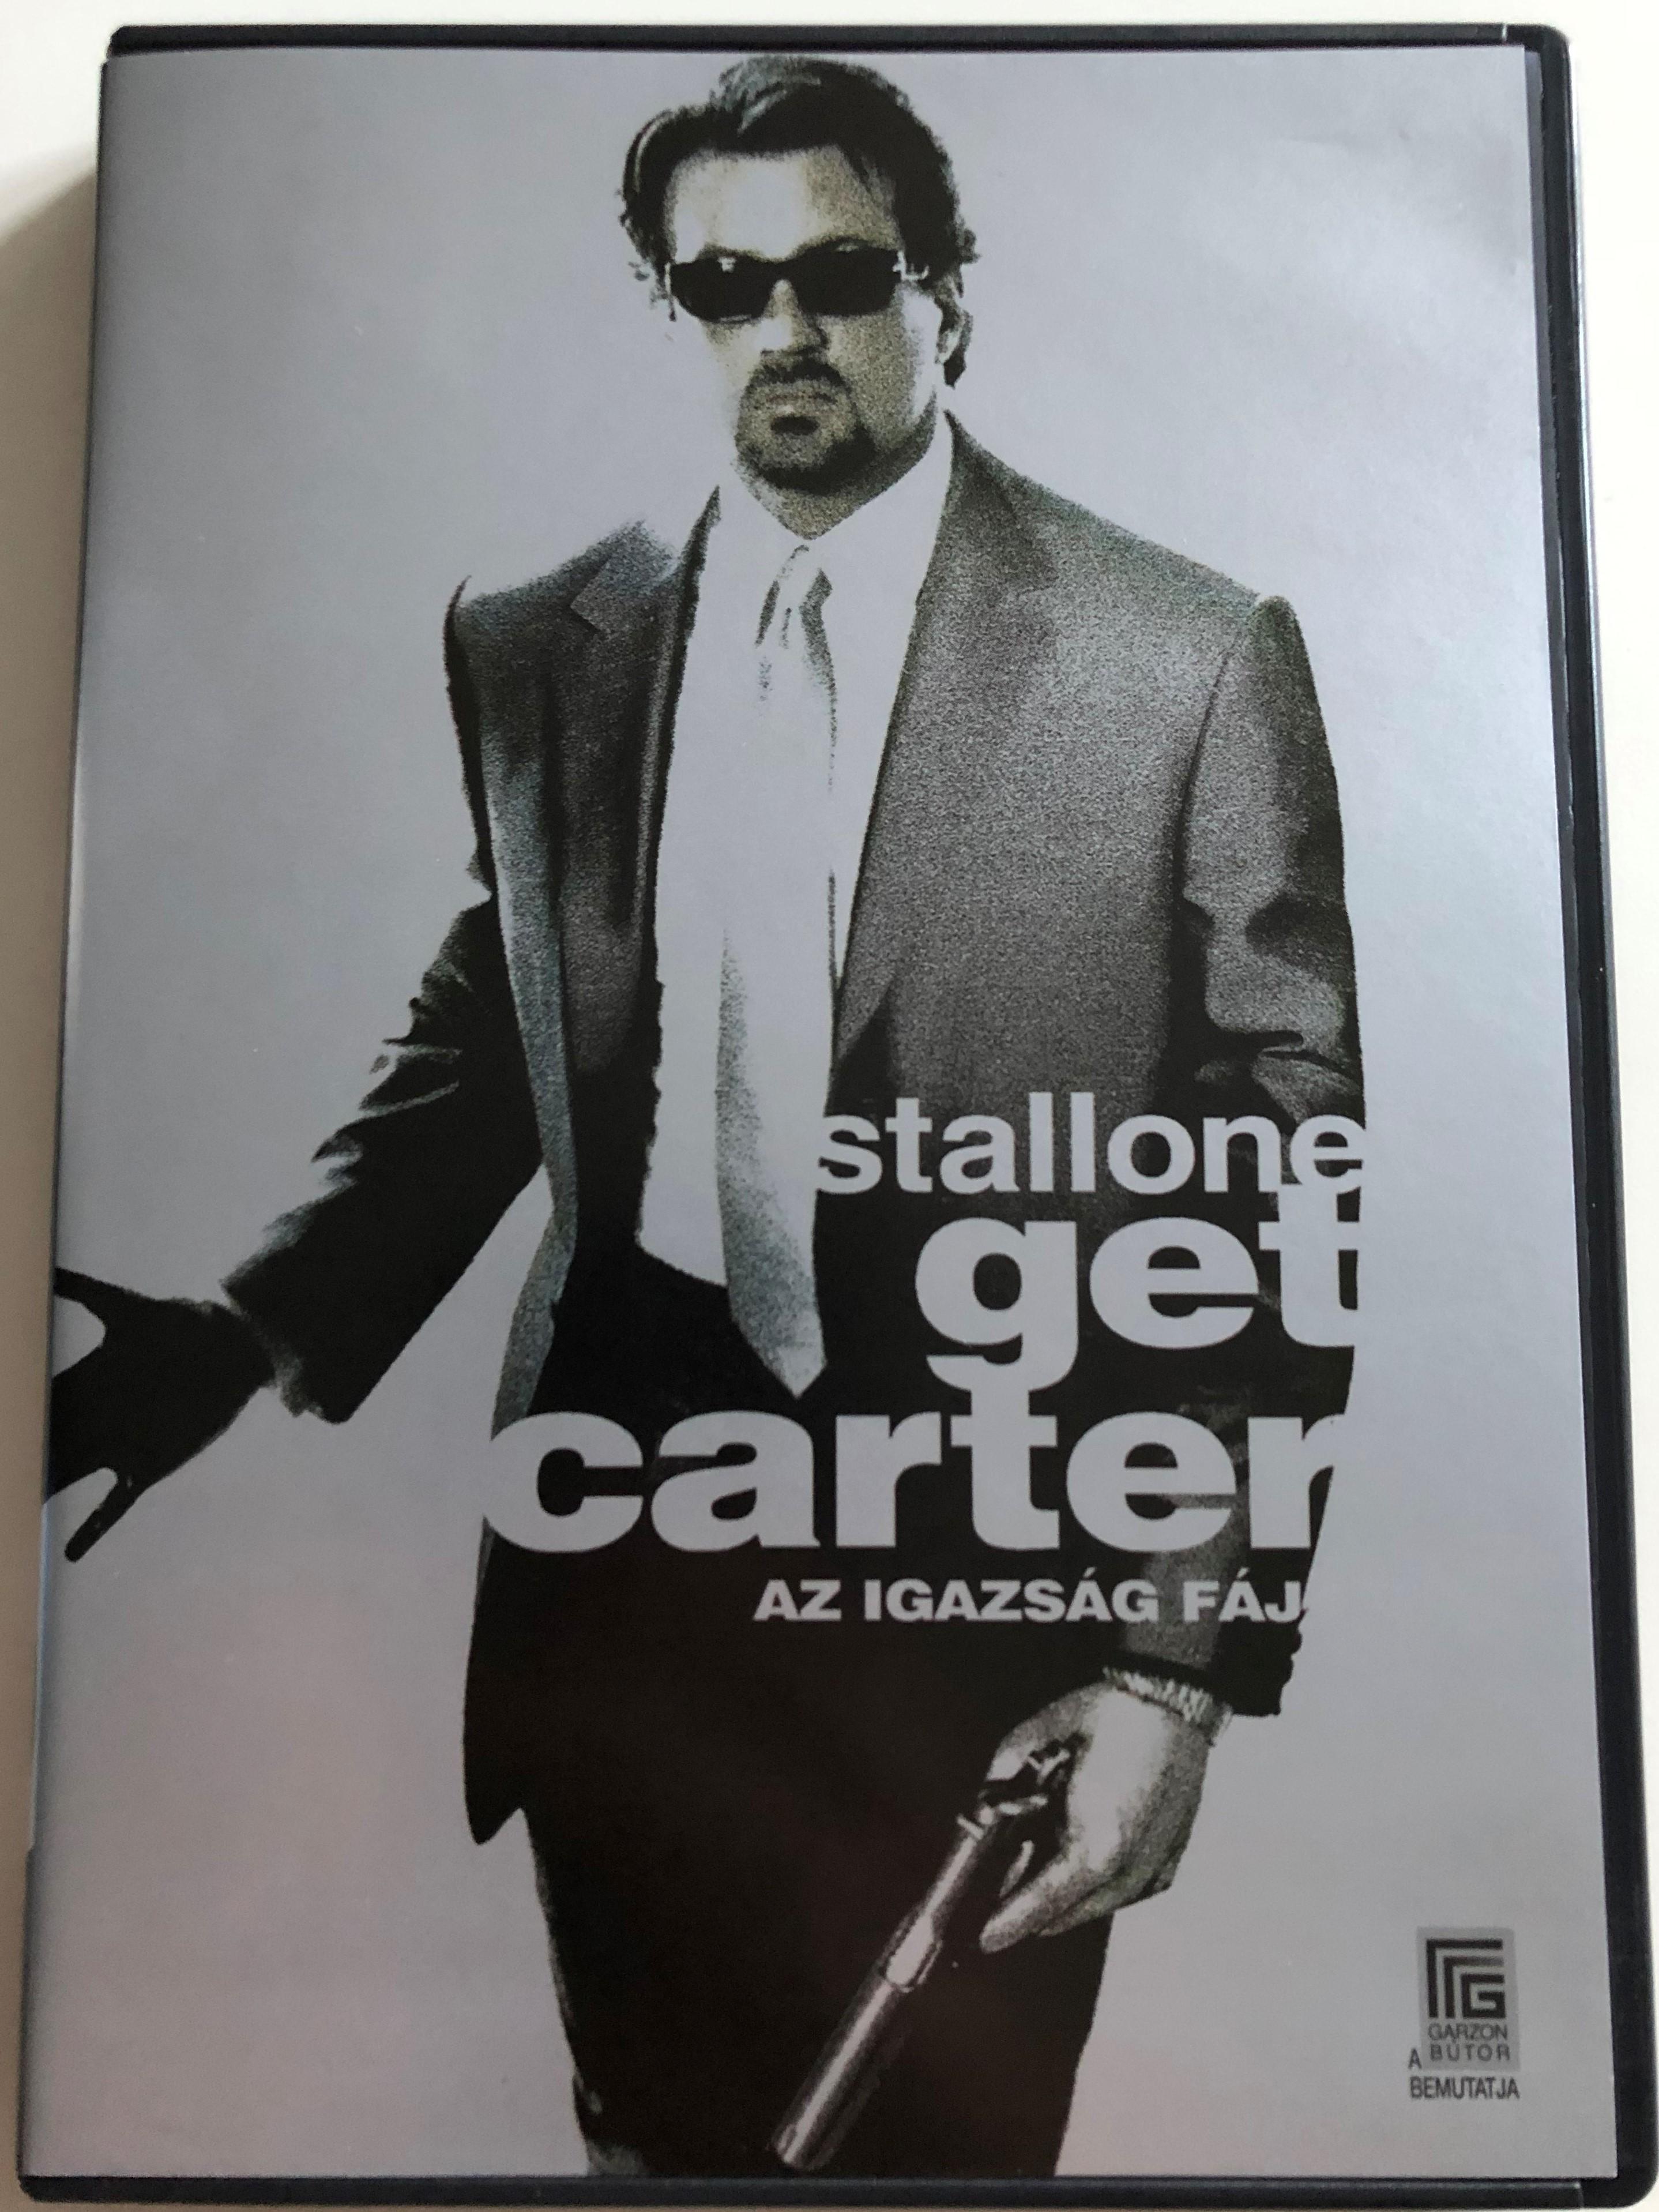 get-carter-dvd-2000-az-igazs-g-f-j-directed-by-stephen-kay-starring-sylvester-stallone-miranda-richardson-rachael-leigh-cook-rhona-mitra-1-.jpg